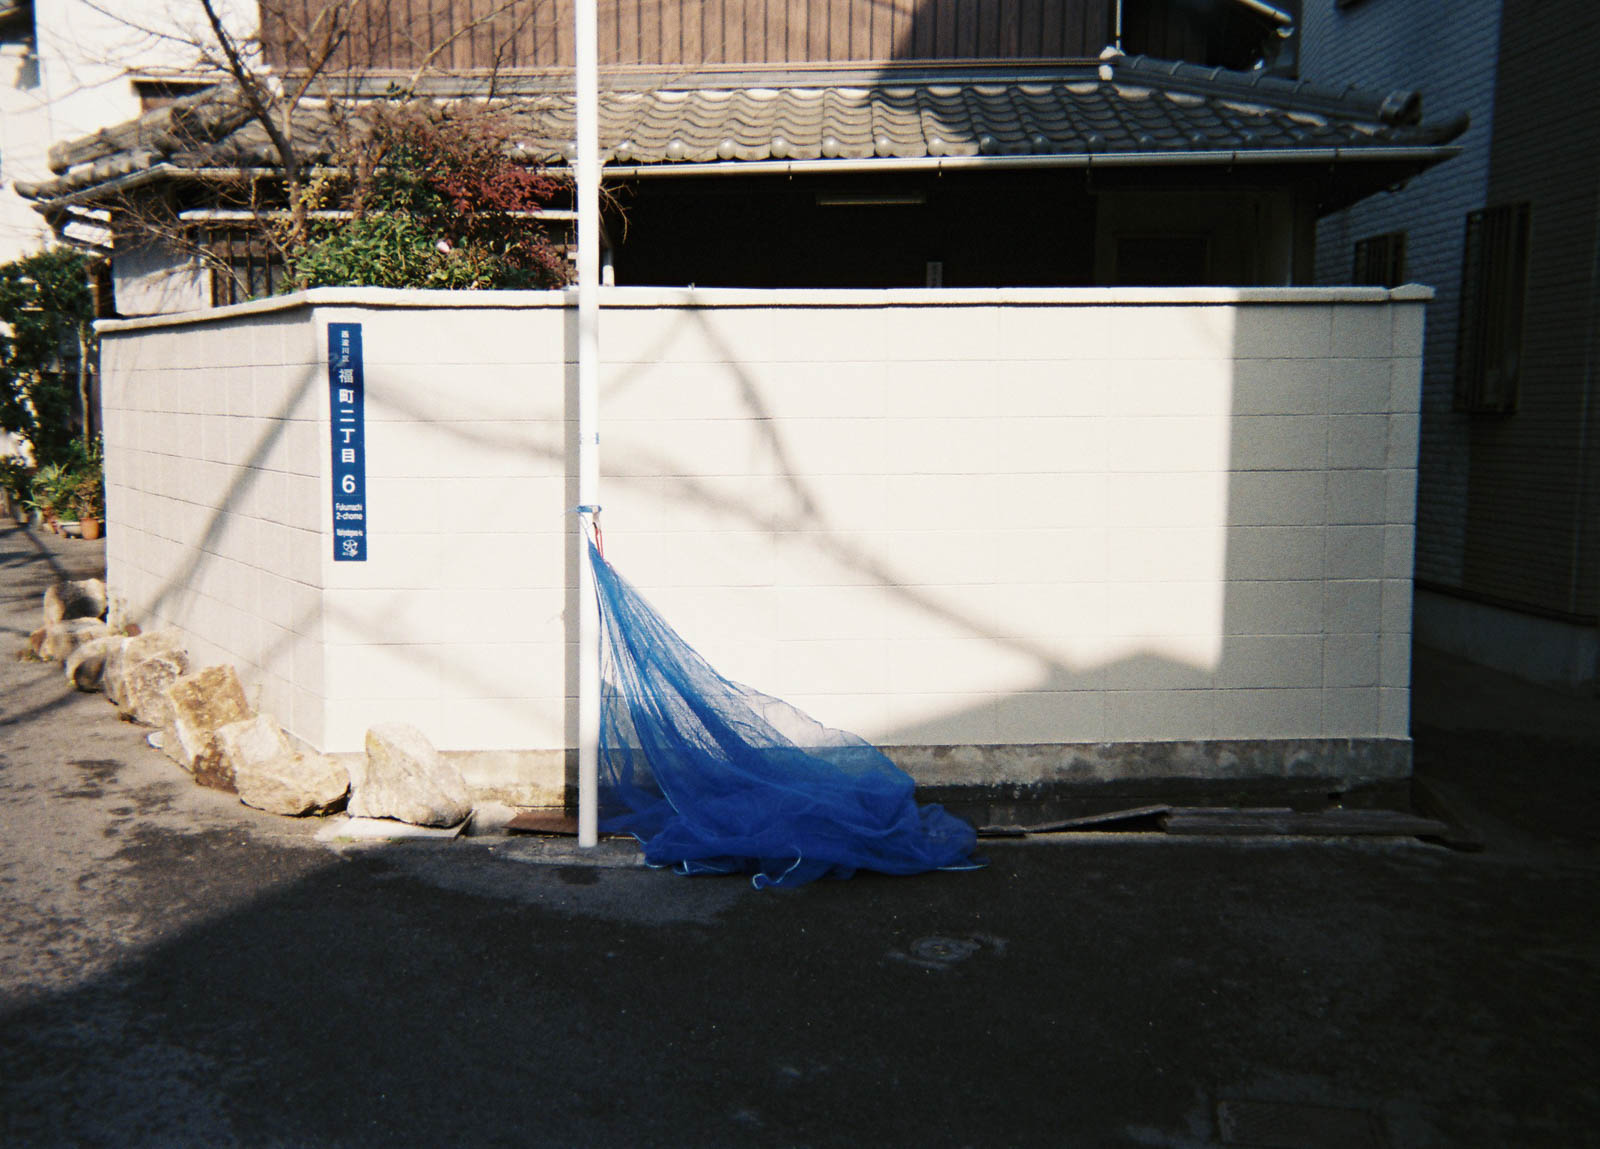 utsuru_mik_snap-002